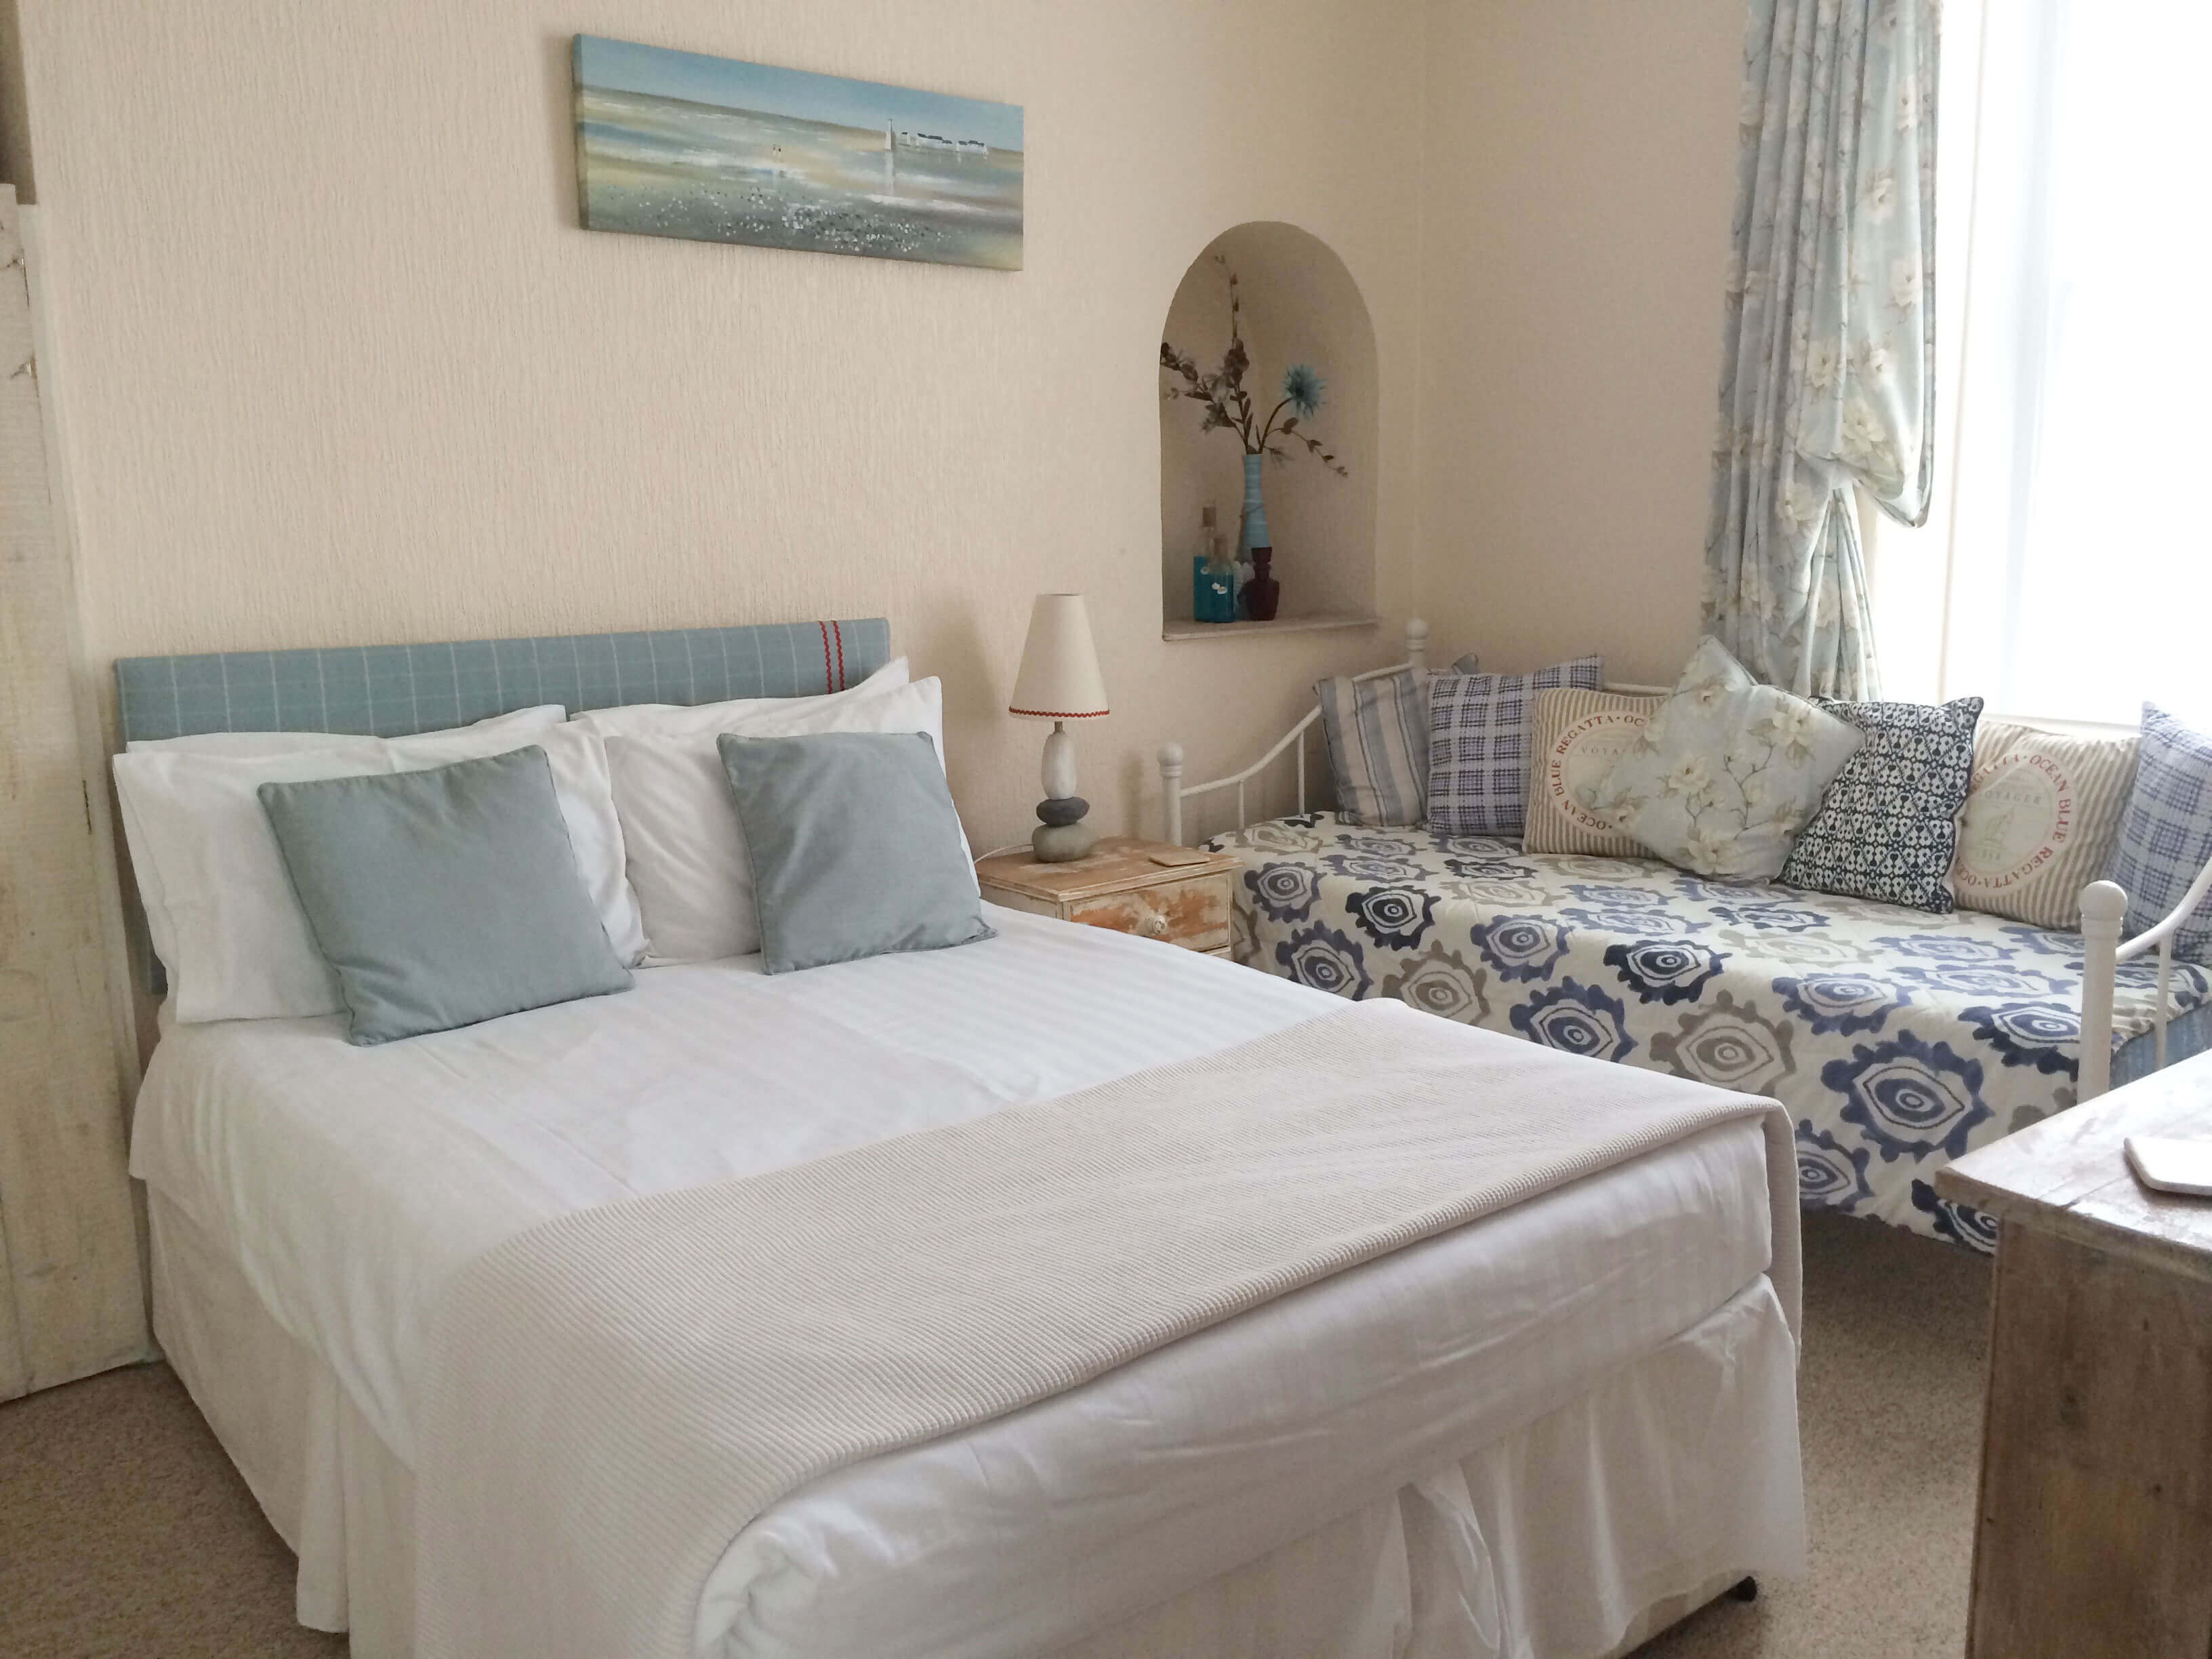 The Phantele Bed & Breakfast - Image 2 - UK Tourism Online